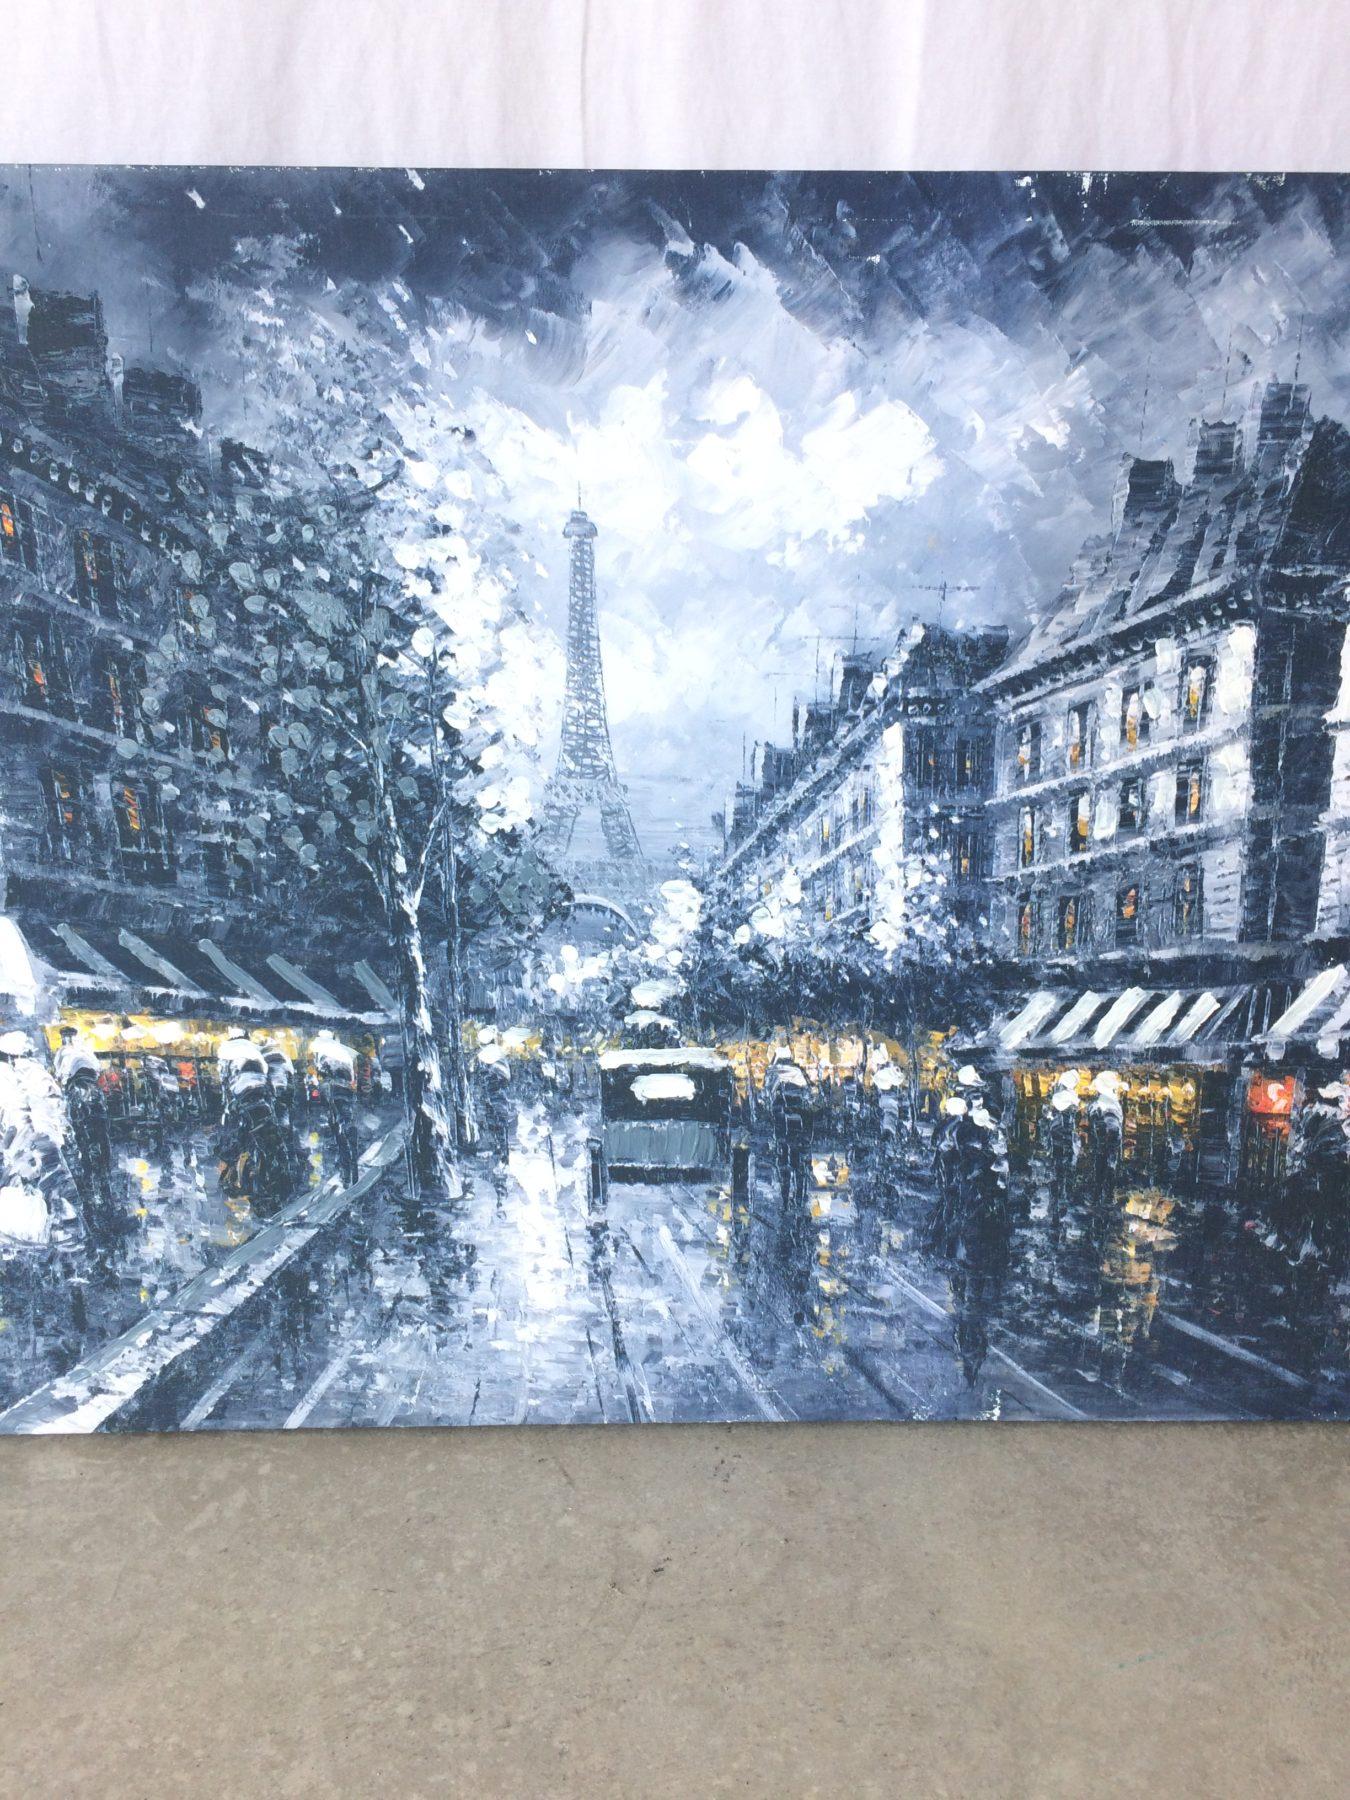 Paris picture with Eiffel tower/street/buildings – canvas – M&M Home ...